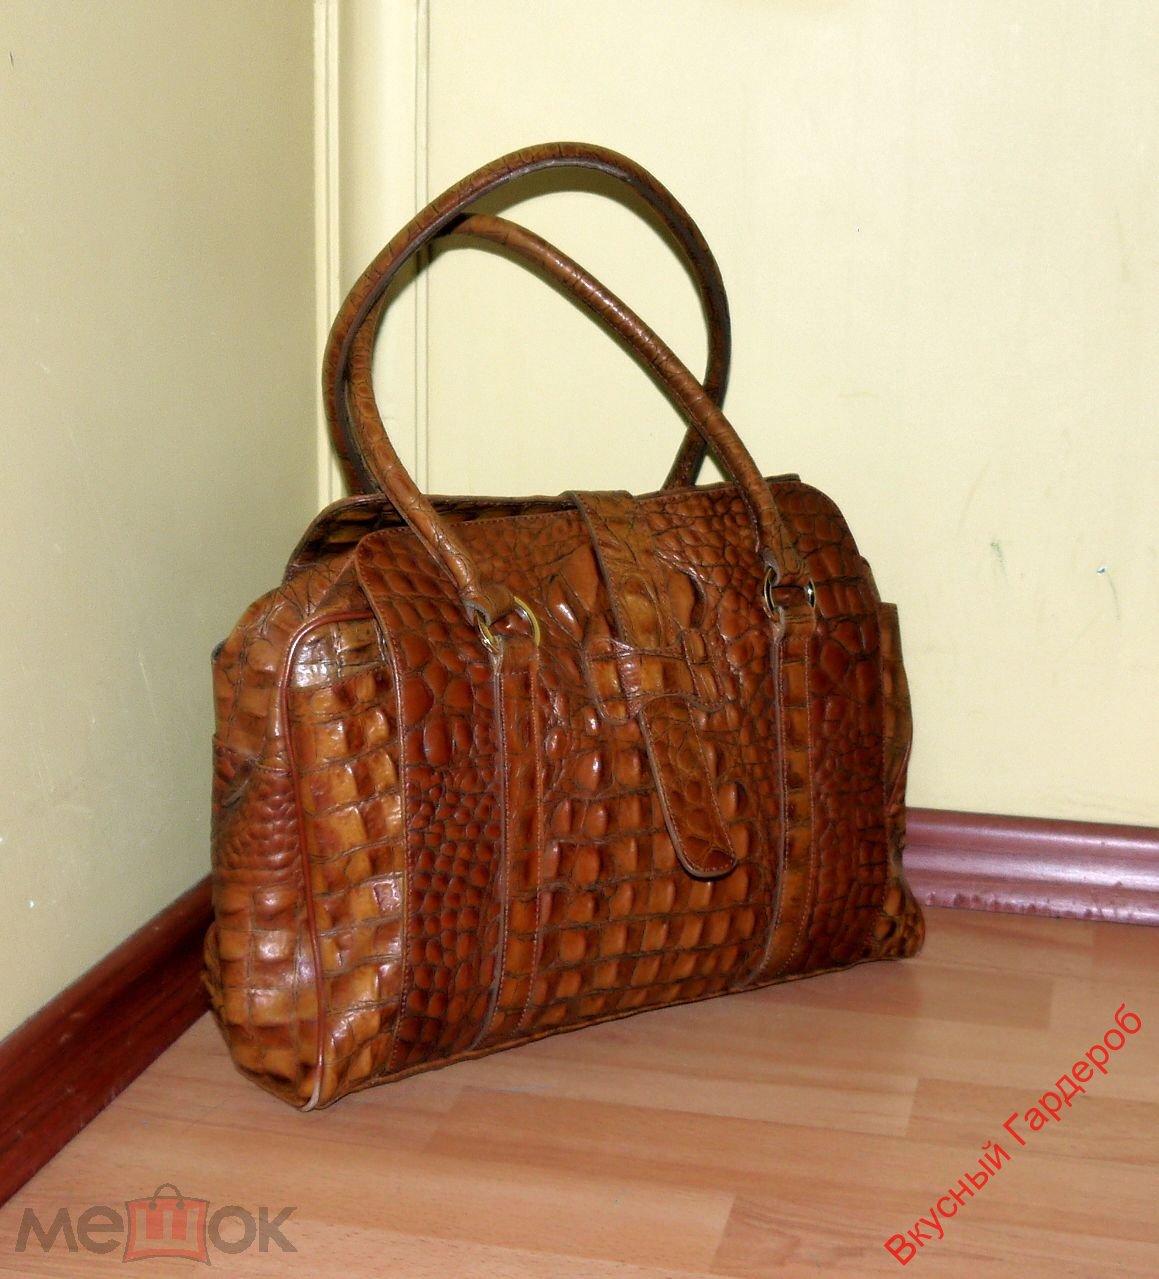 d336882ae804 Bella Donna! Эксклюзивная сумка Domani – натуральная кожа крокодила ...